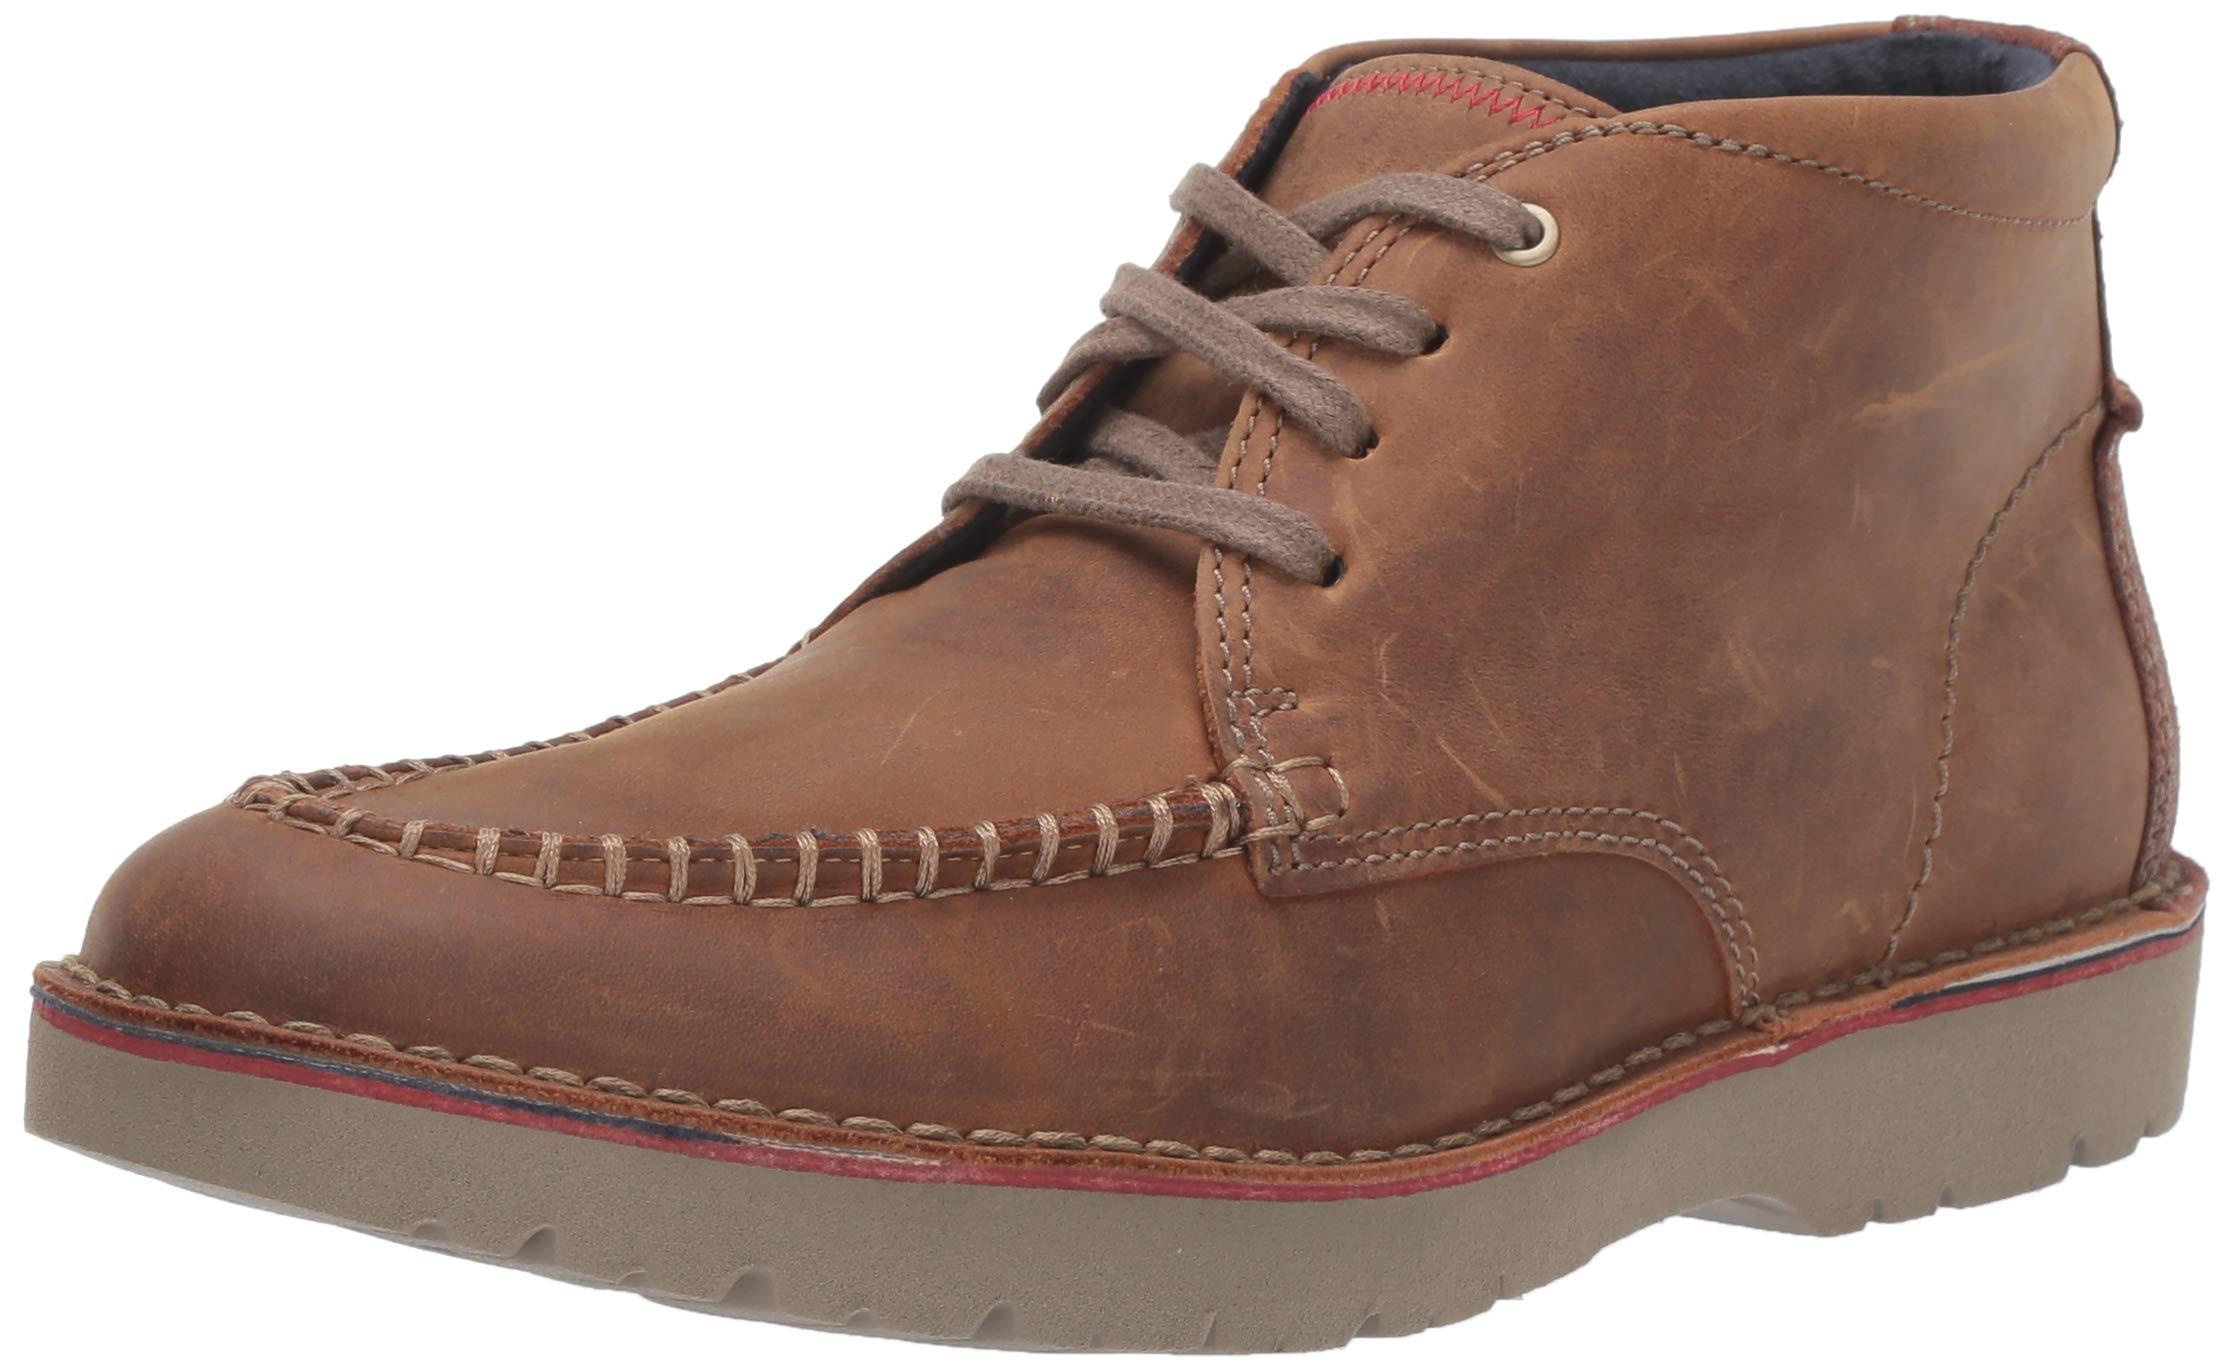 Clarks Men's Vargo Apron Ankle Boot 1